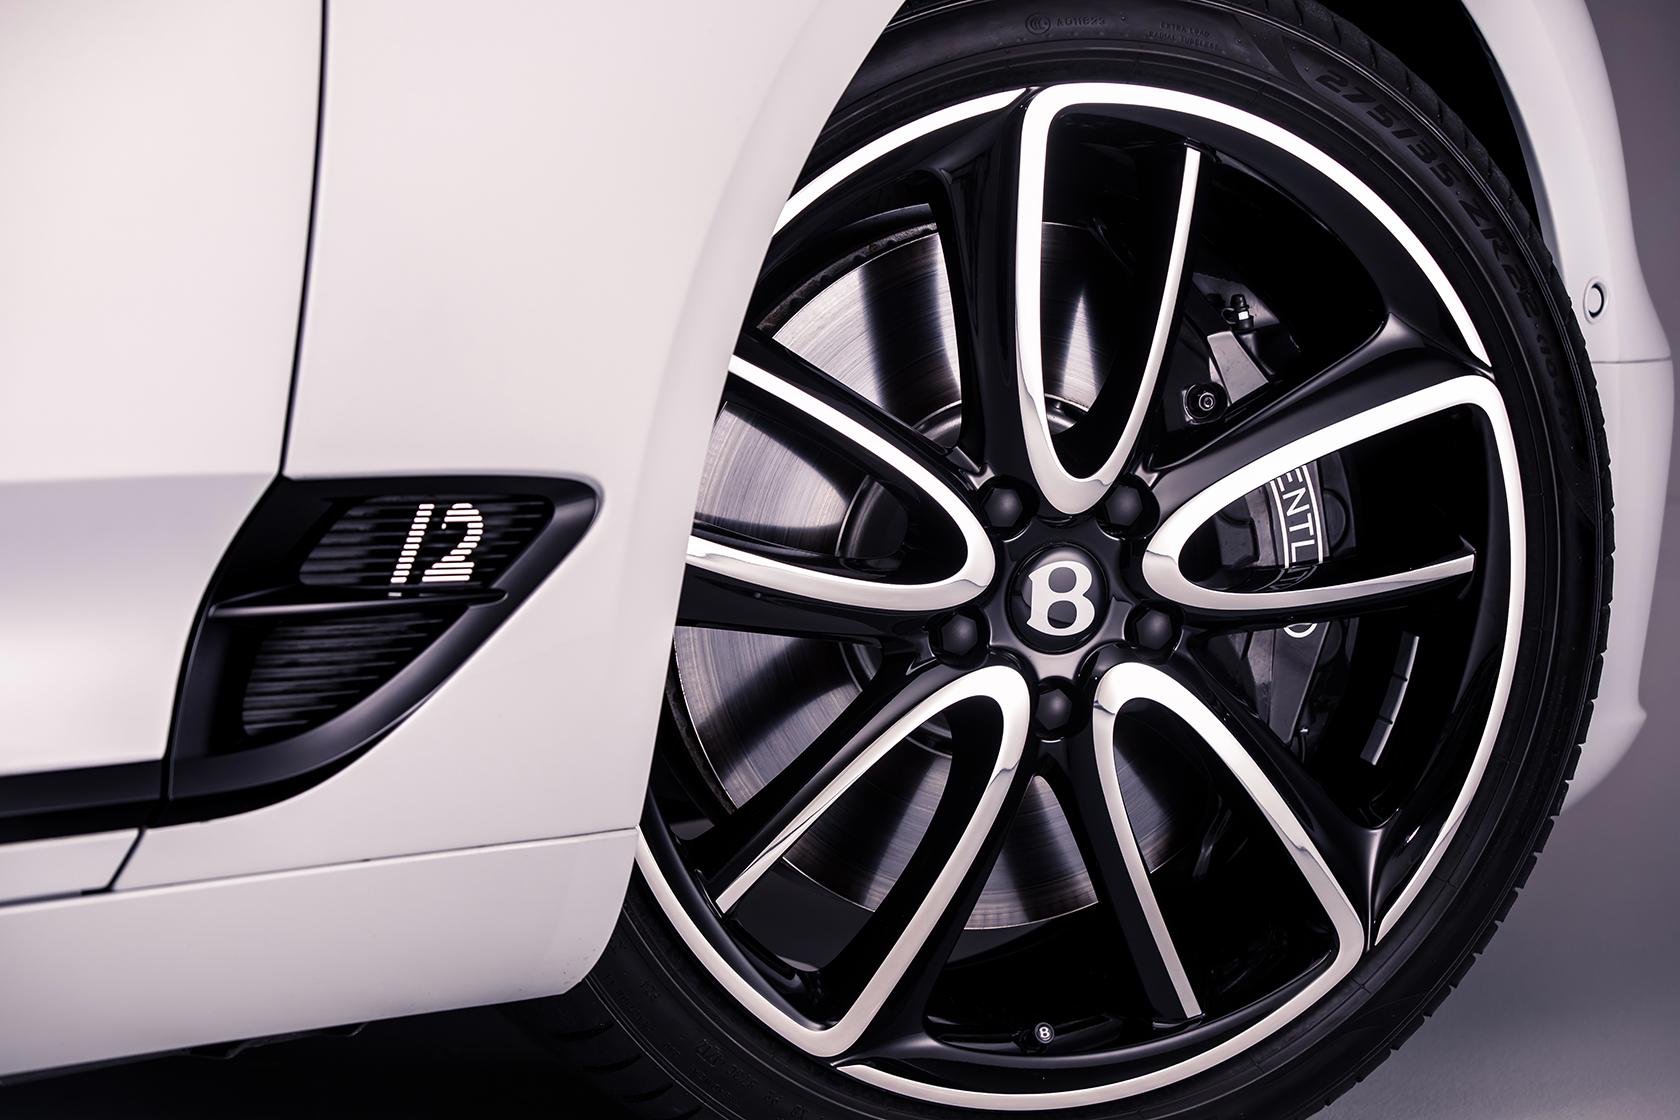 Essai auto Trajectoire magazine : Bentley GT Convertible